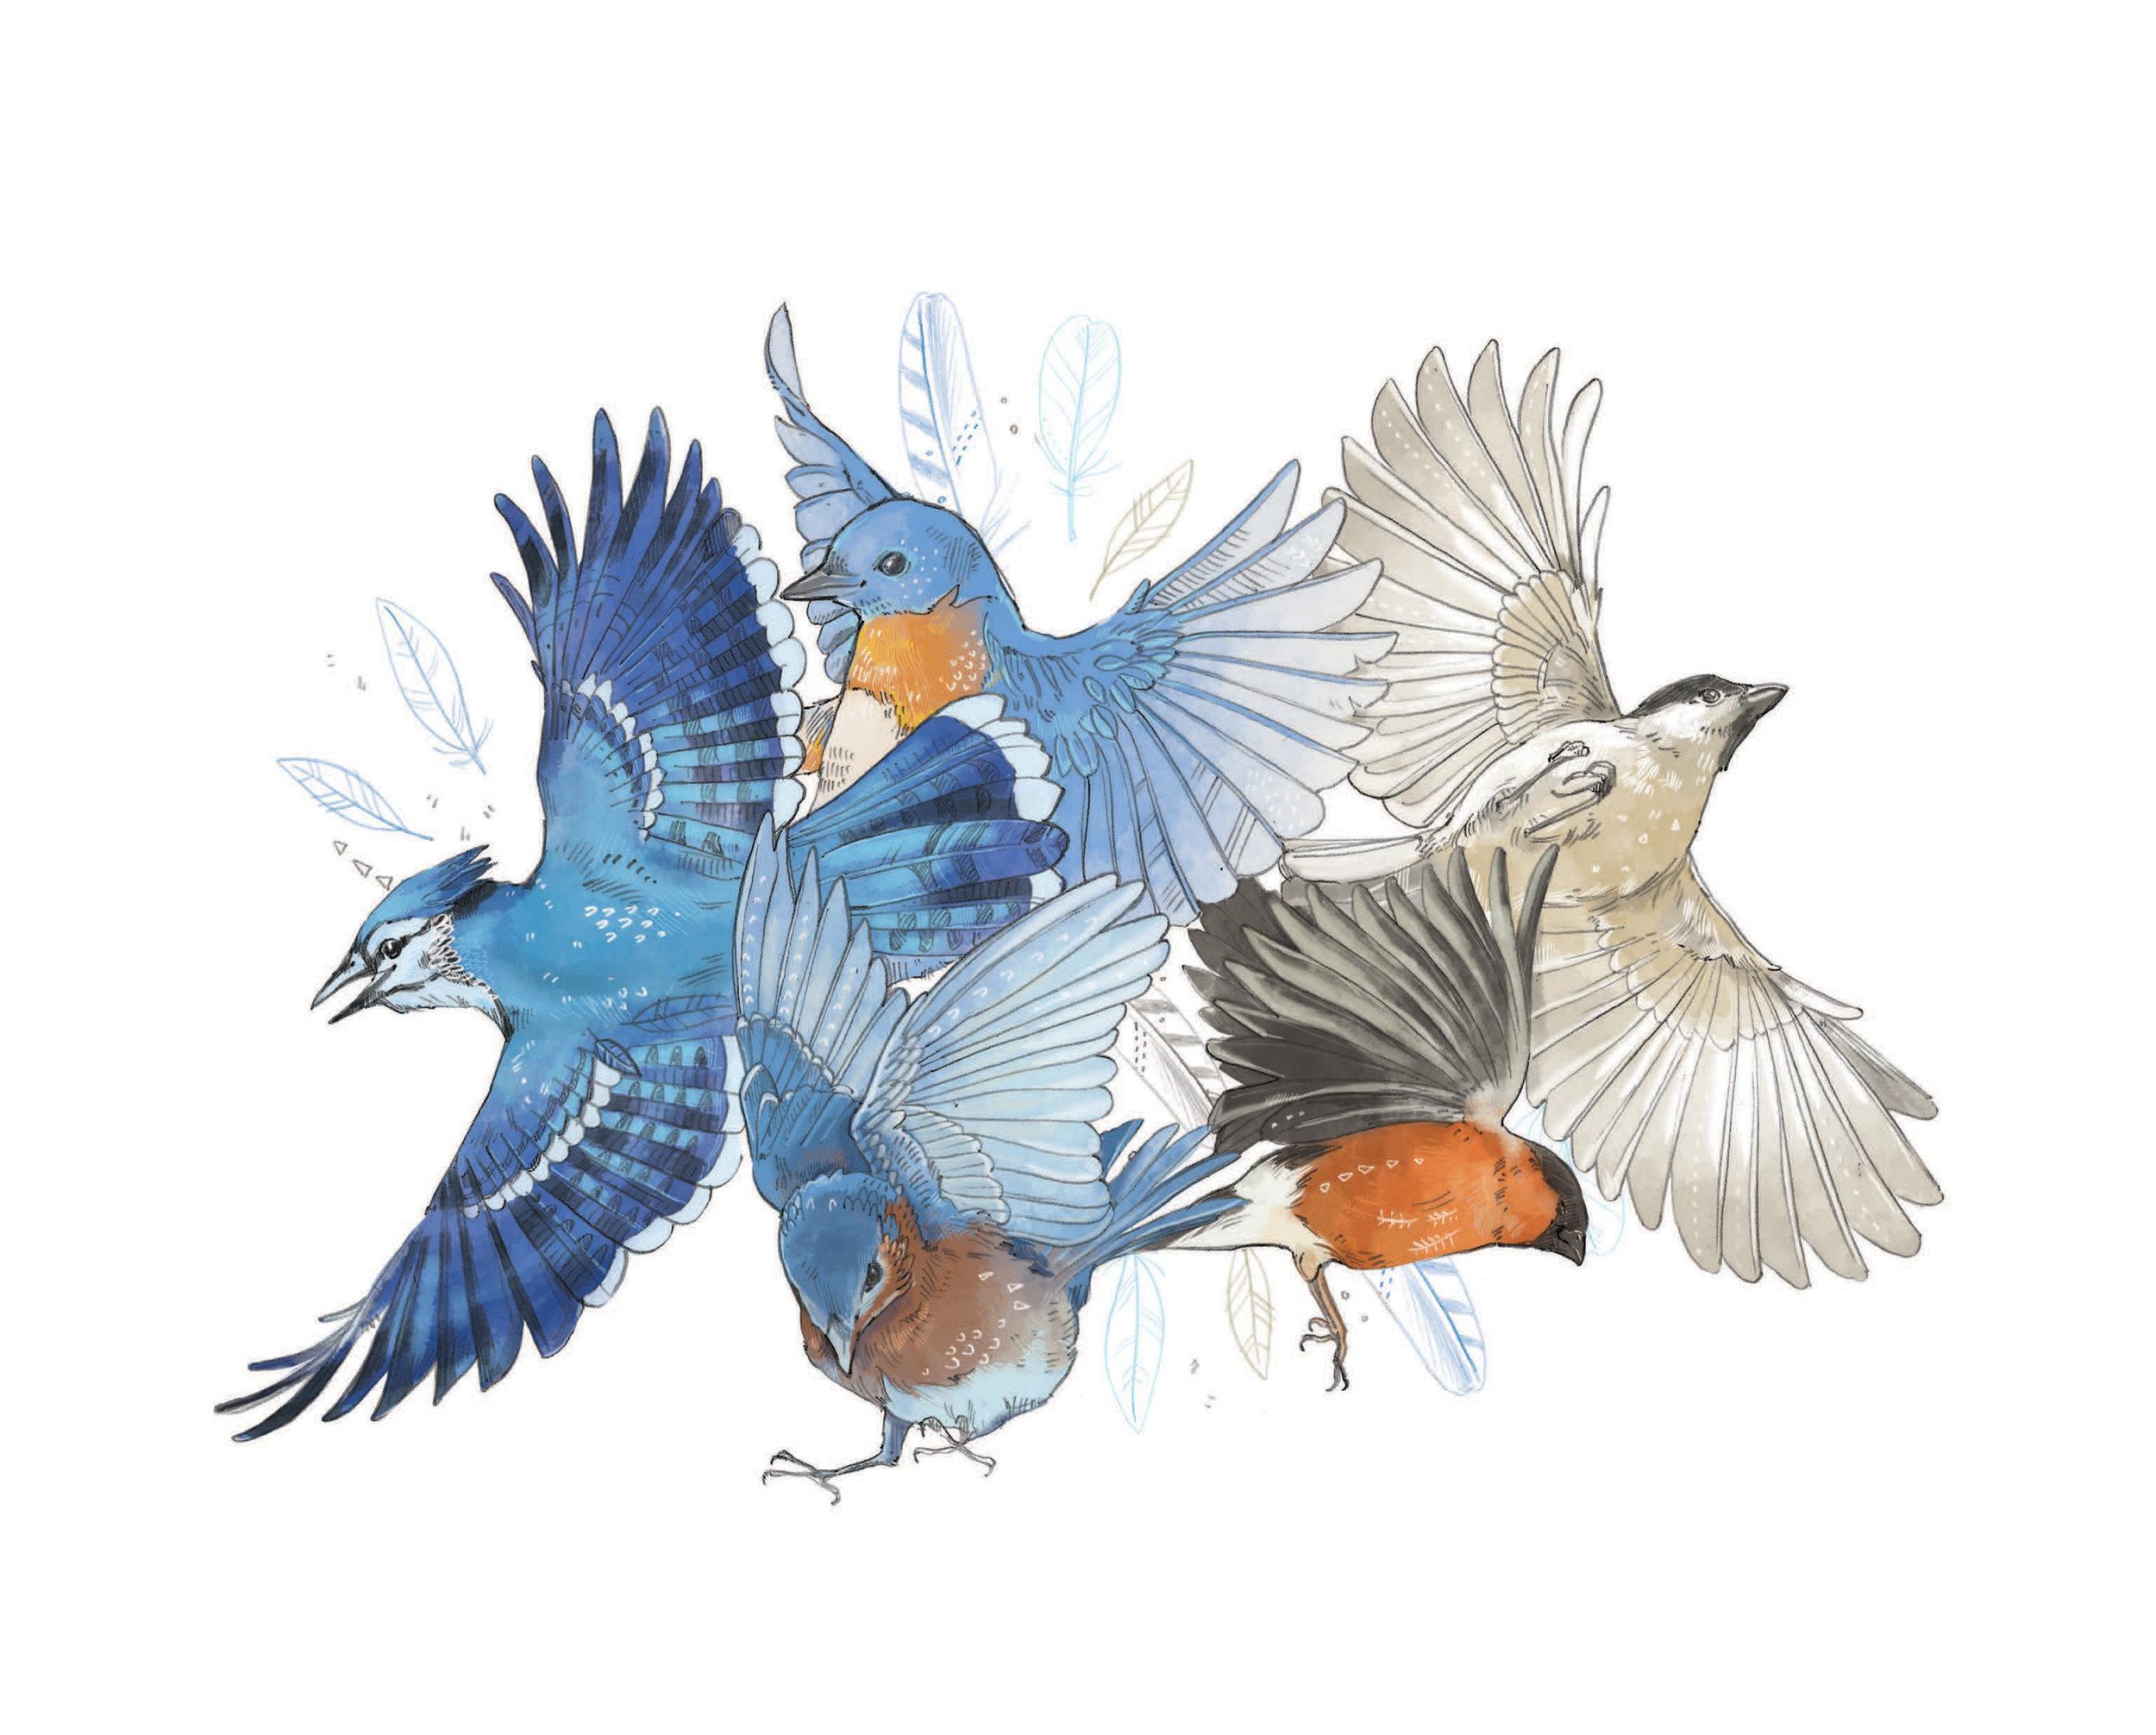 10x8 Print_Birds BLEED.jpg